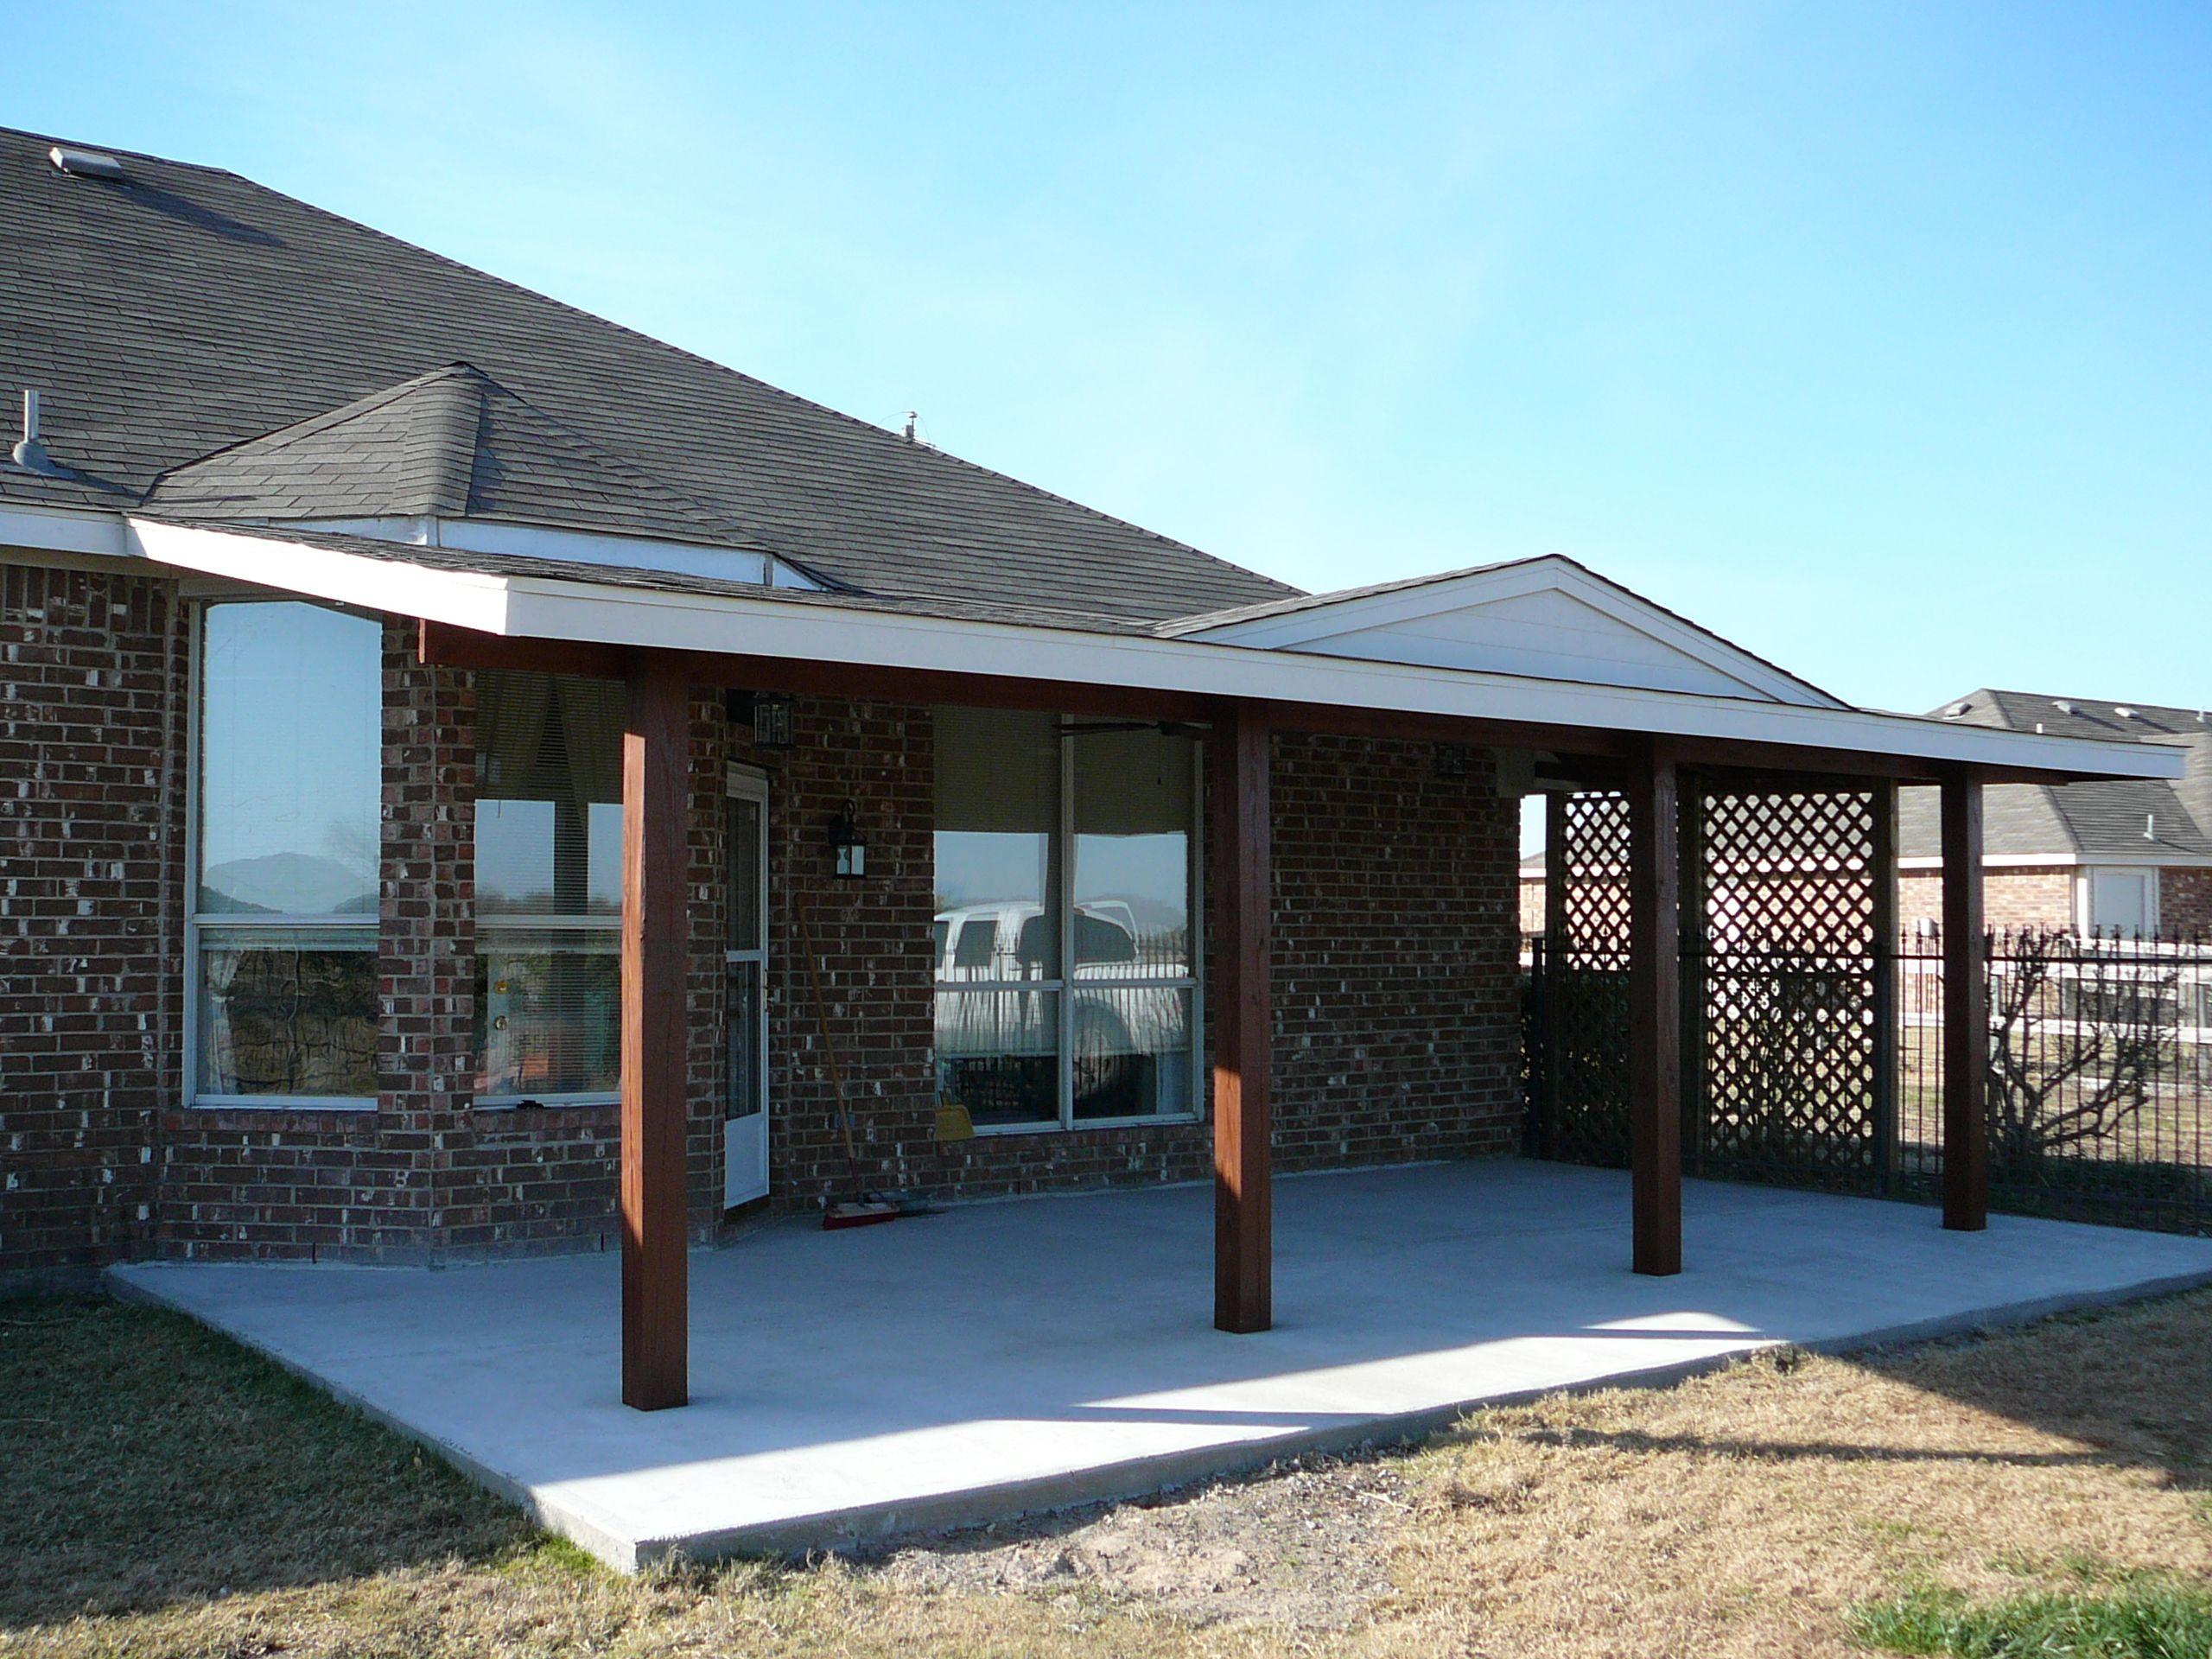 Cement Patio   Cedar Wood Patio Cover With Cedar Posts   Harper  Construction TX